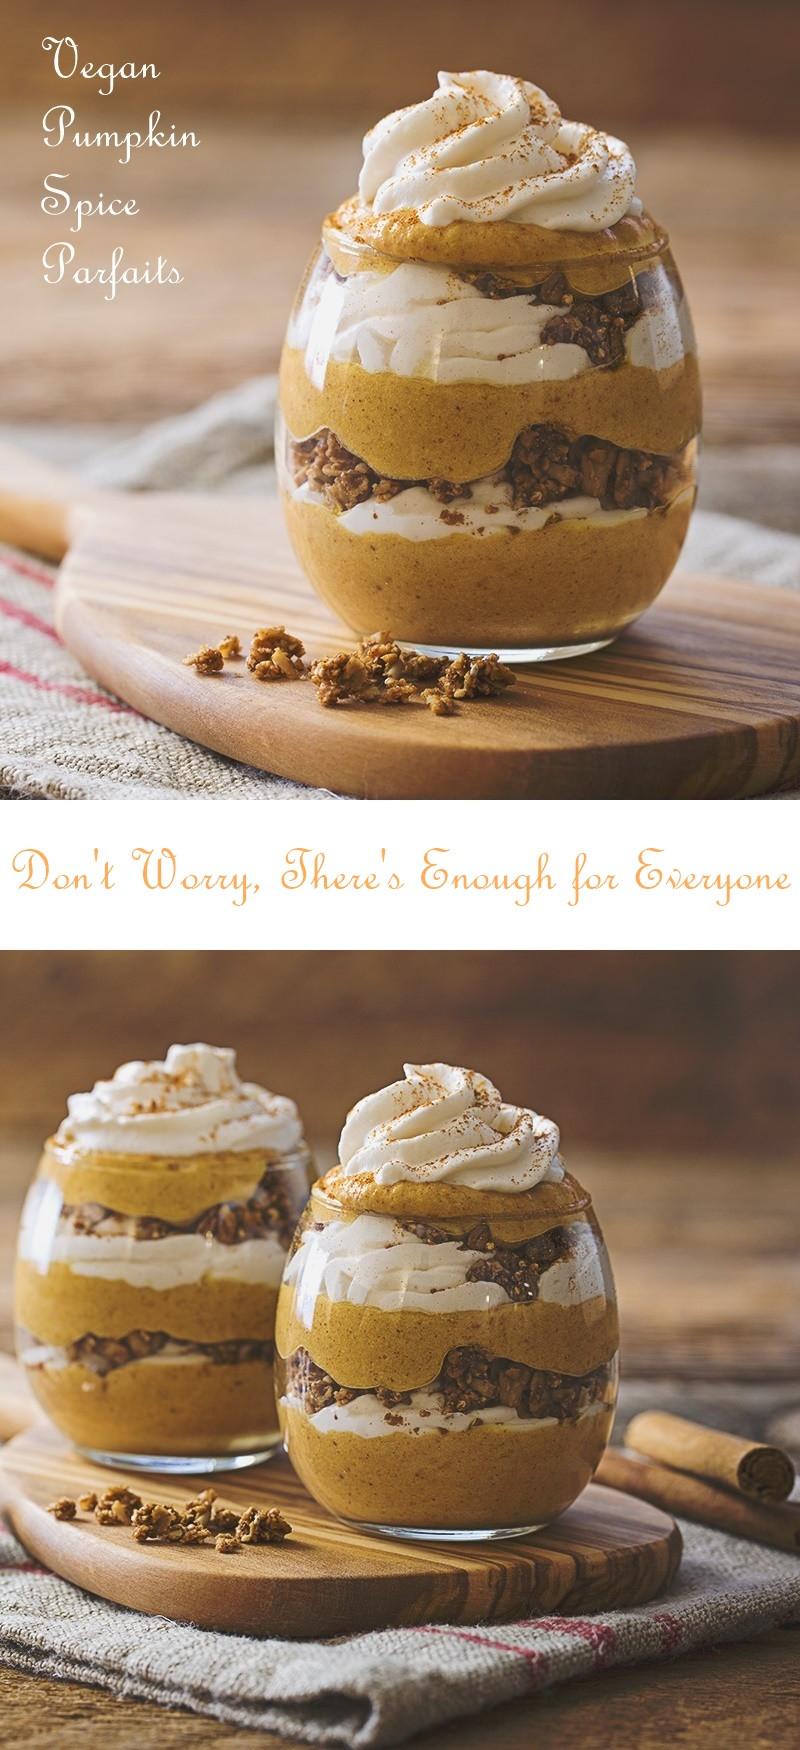 Vegan Pumpkin Desserts Recipes  Vegan Pumpkin Spice Parfaits Recipe Gluten Free